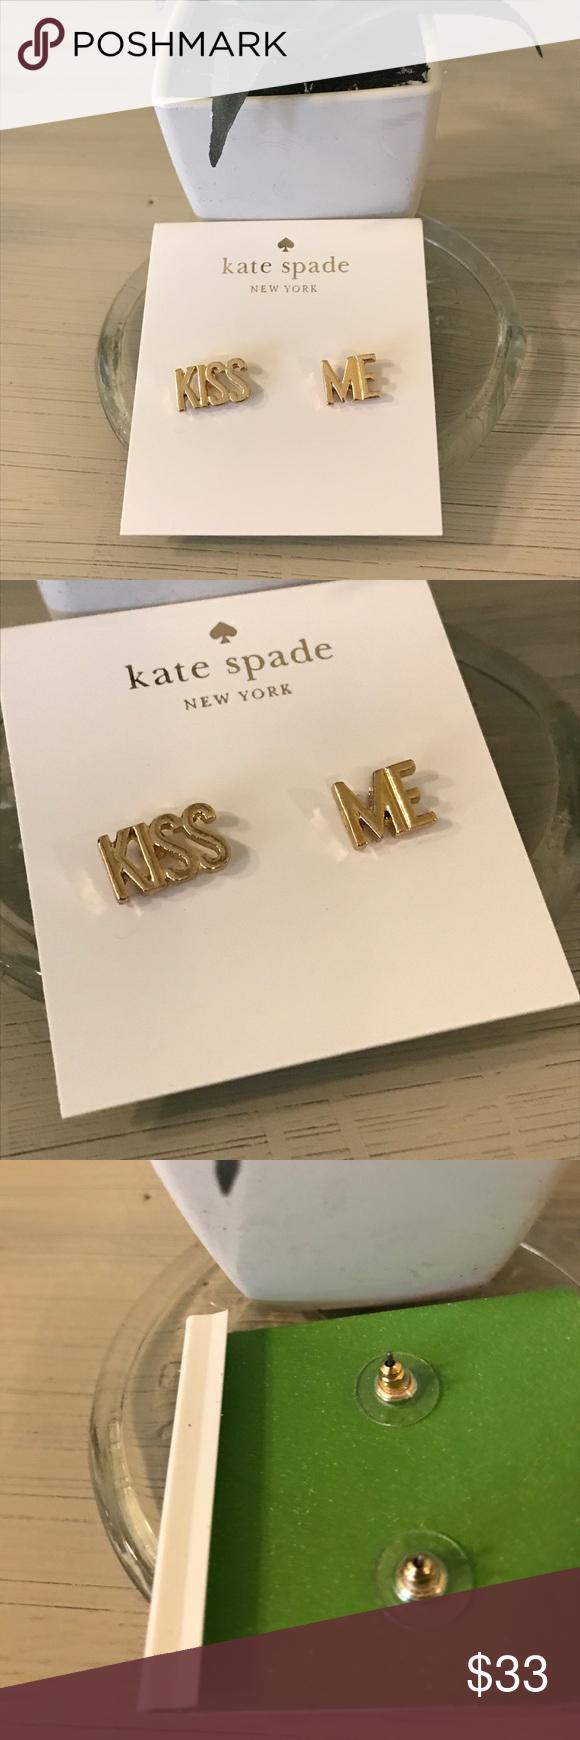 Kate Spade New York  Kiss Me earrings Kate Spade Kiss Me earrings. Gold. Like new. 14k gold plated Kate Spade Jewelry Earrings